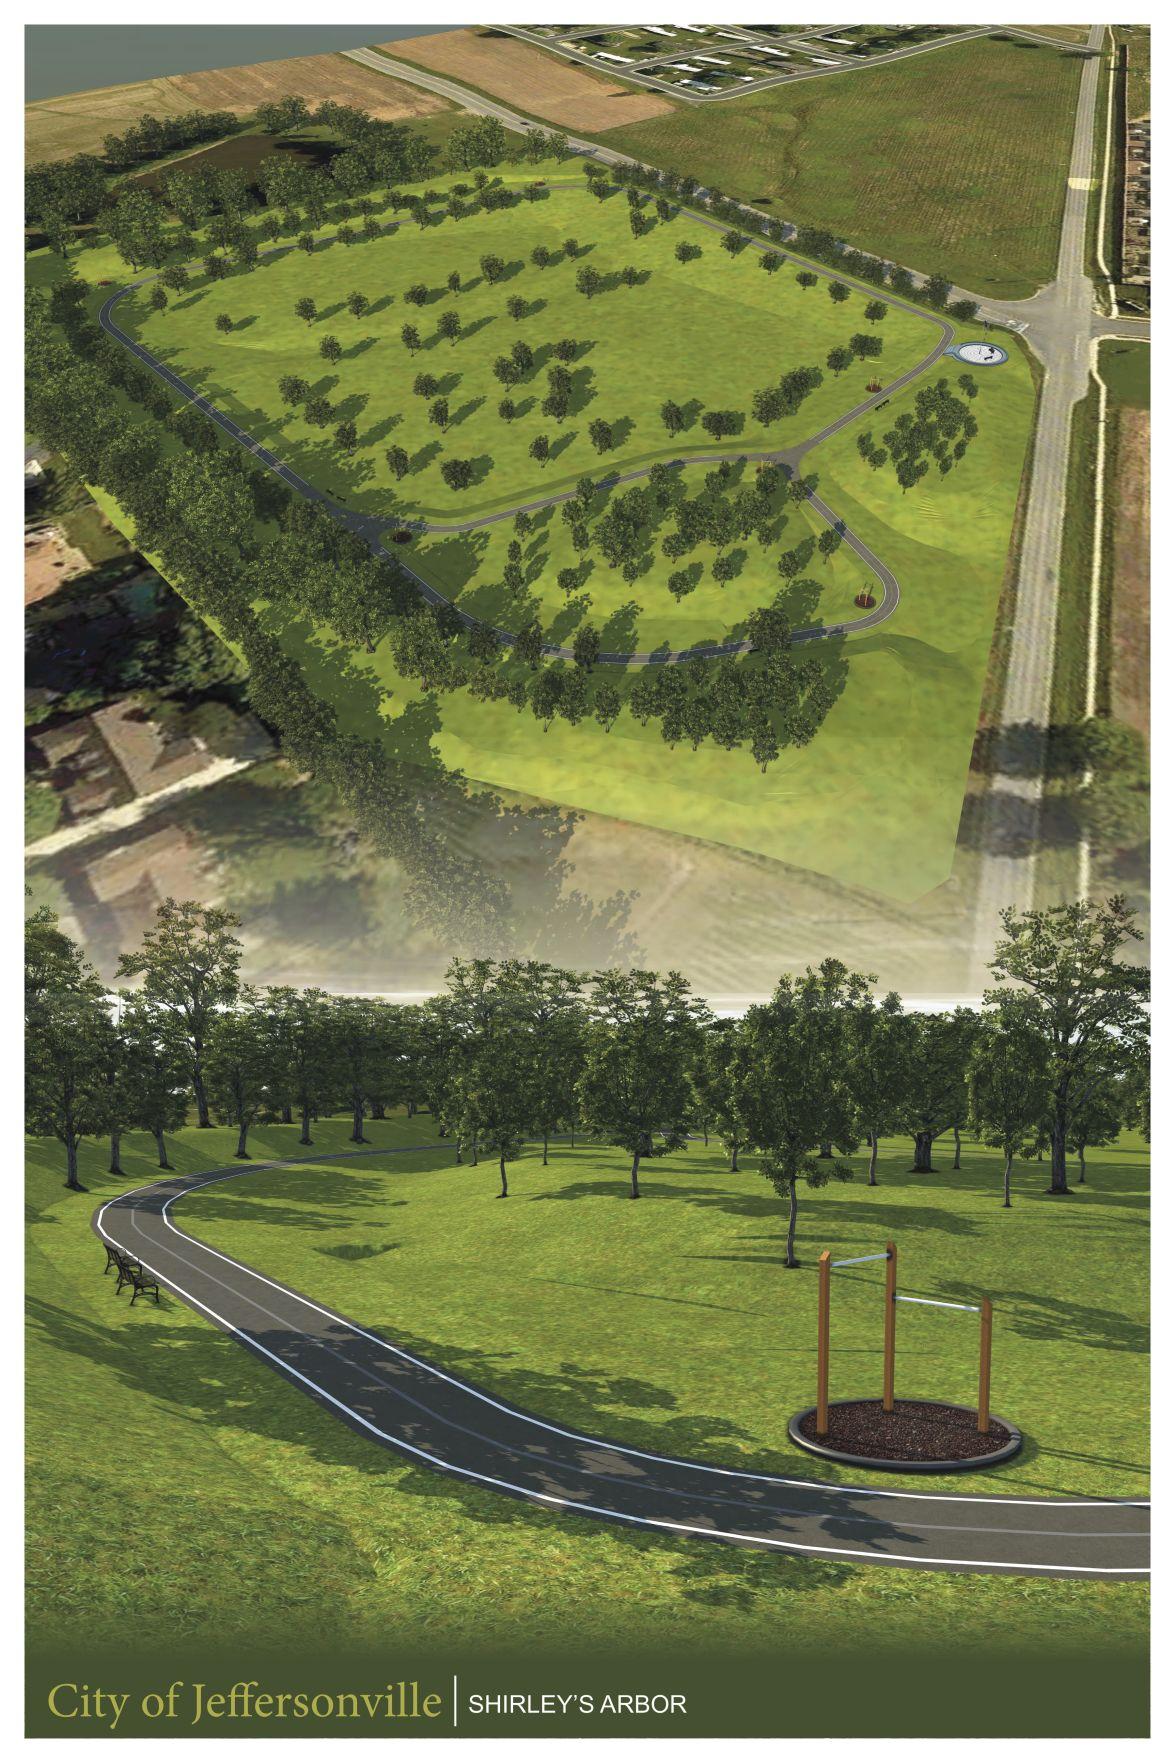 Shirley's Arbor rendering